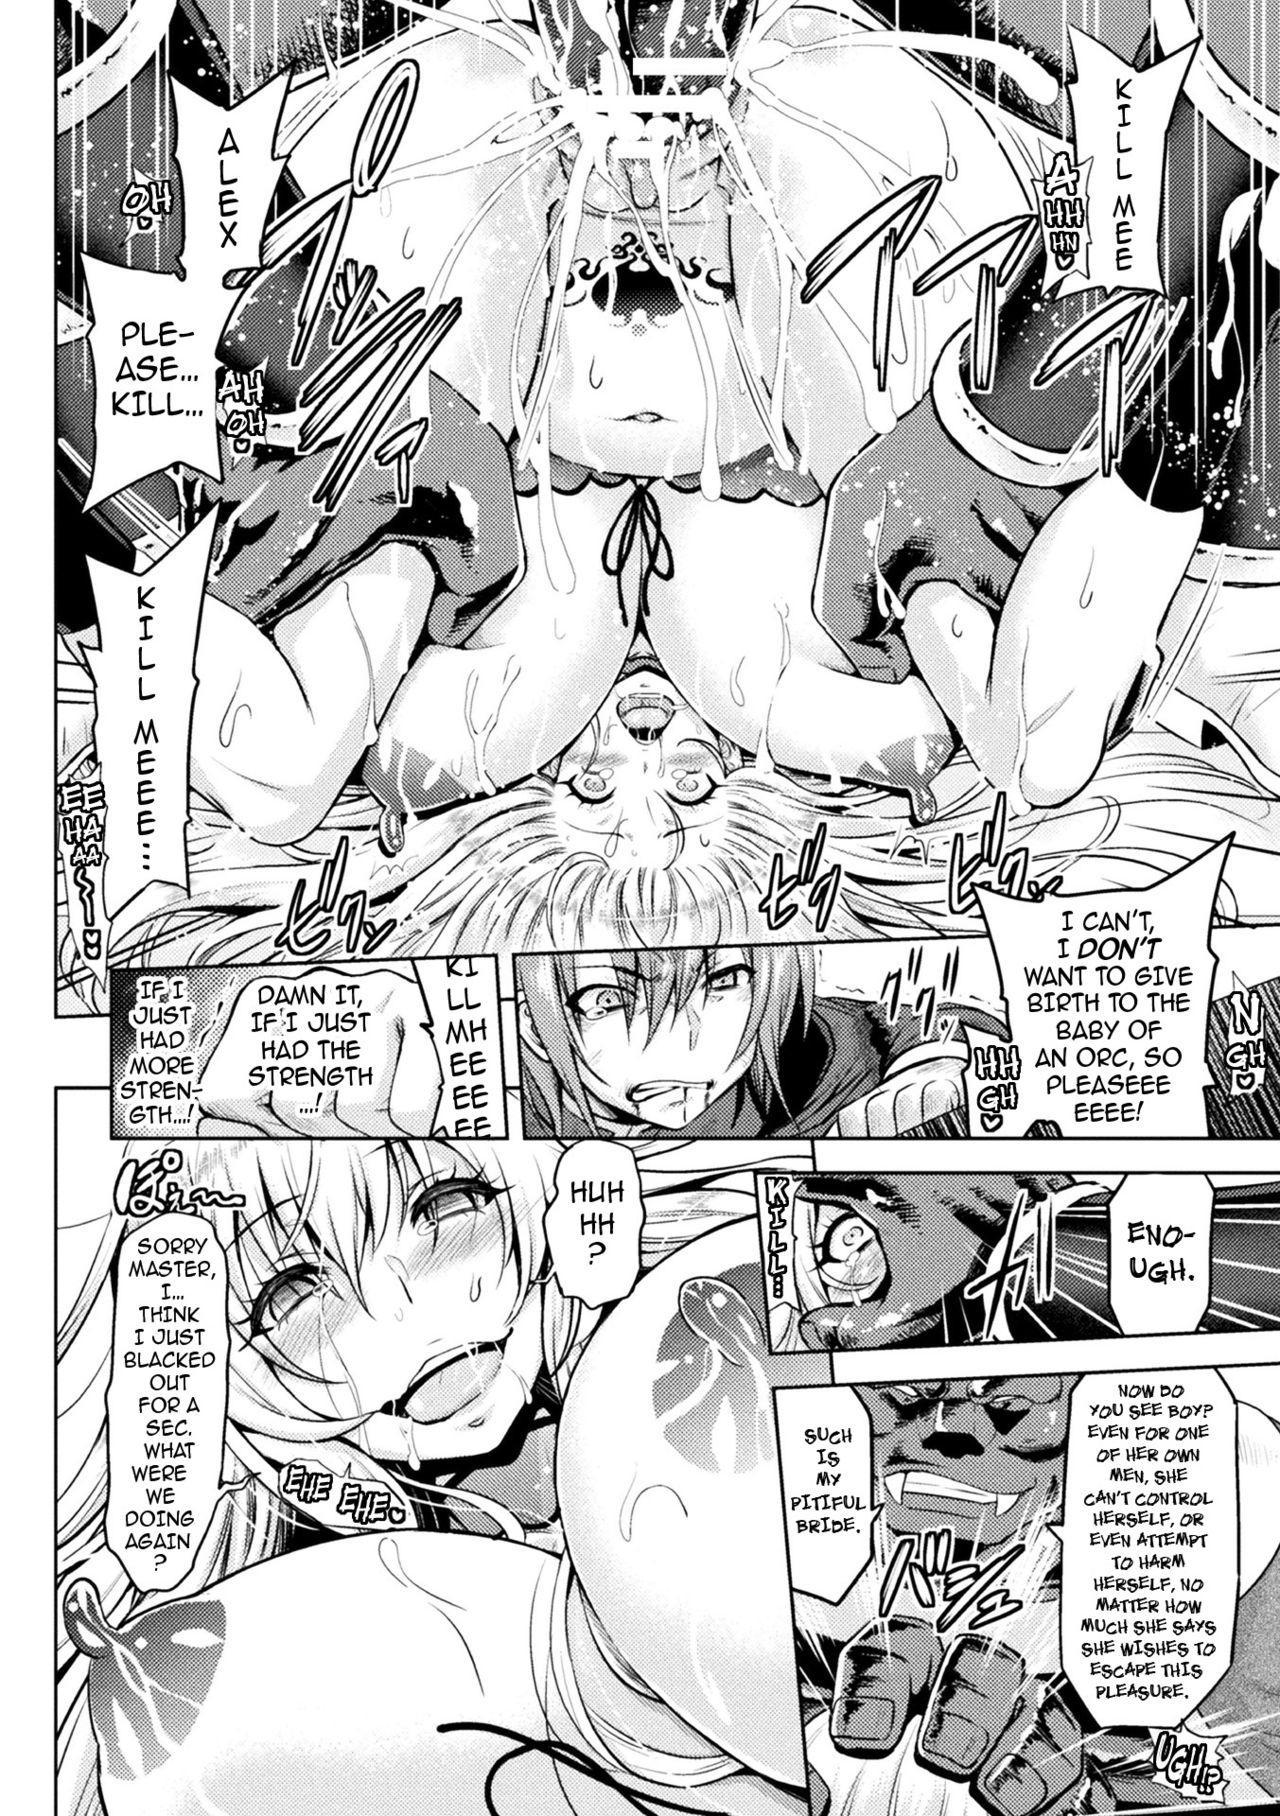 [Yamada Gogogo] Erona ~Orc no Inmon ni Okasareta Onna Kishi no Matsuro~   Erona ~The Fall of a Beautiful Knight Cursed with the Lewd Mark of an Orc~ Ch. 1-6 [English] {darknight} 122